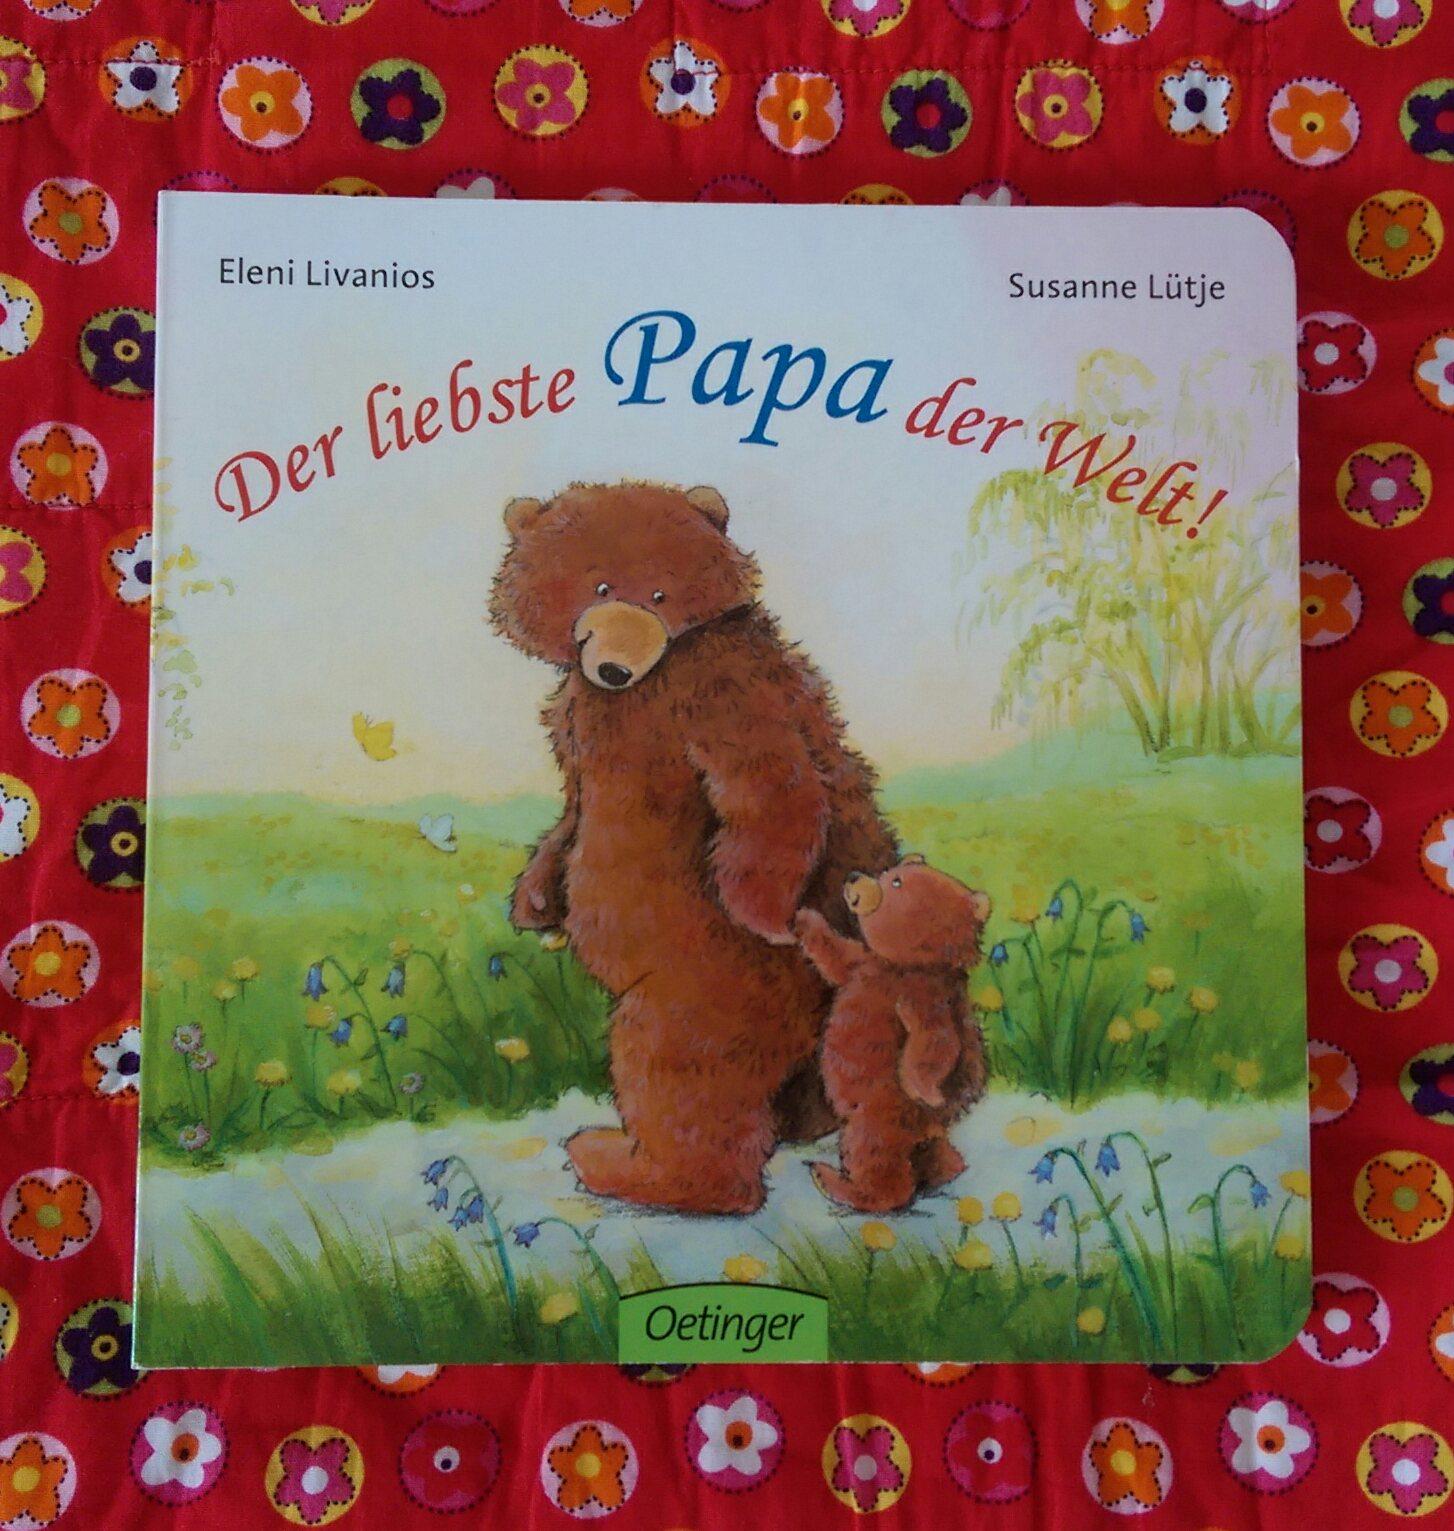 Lieblingsbuch des Monats: Der liebste Papa der Welt